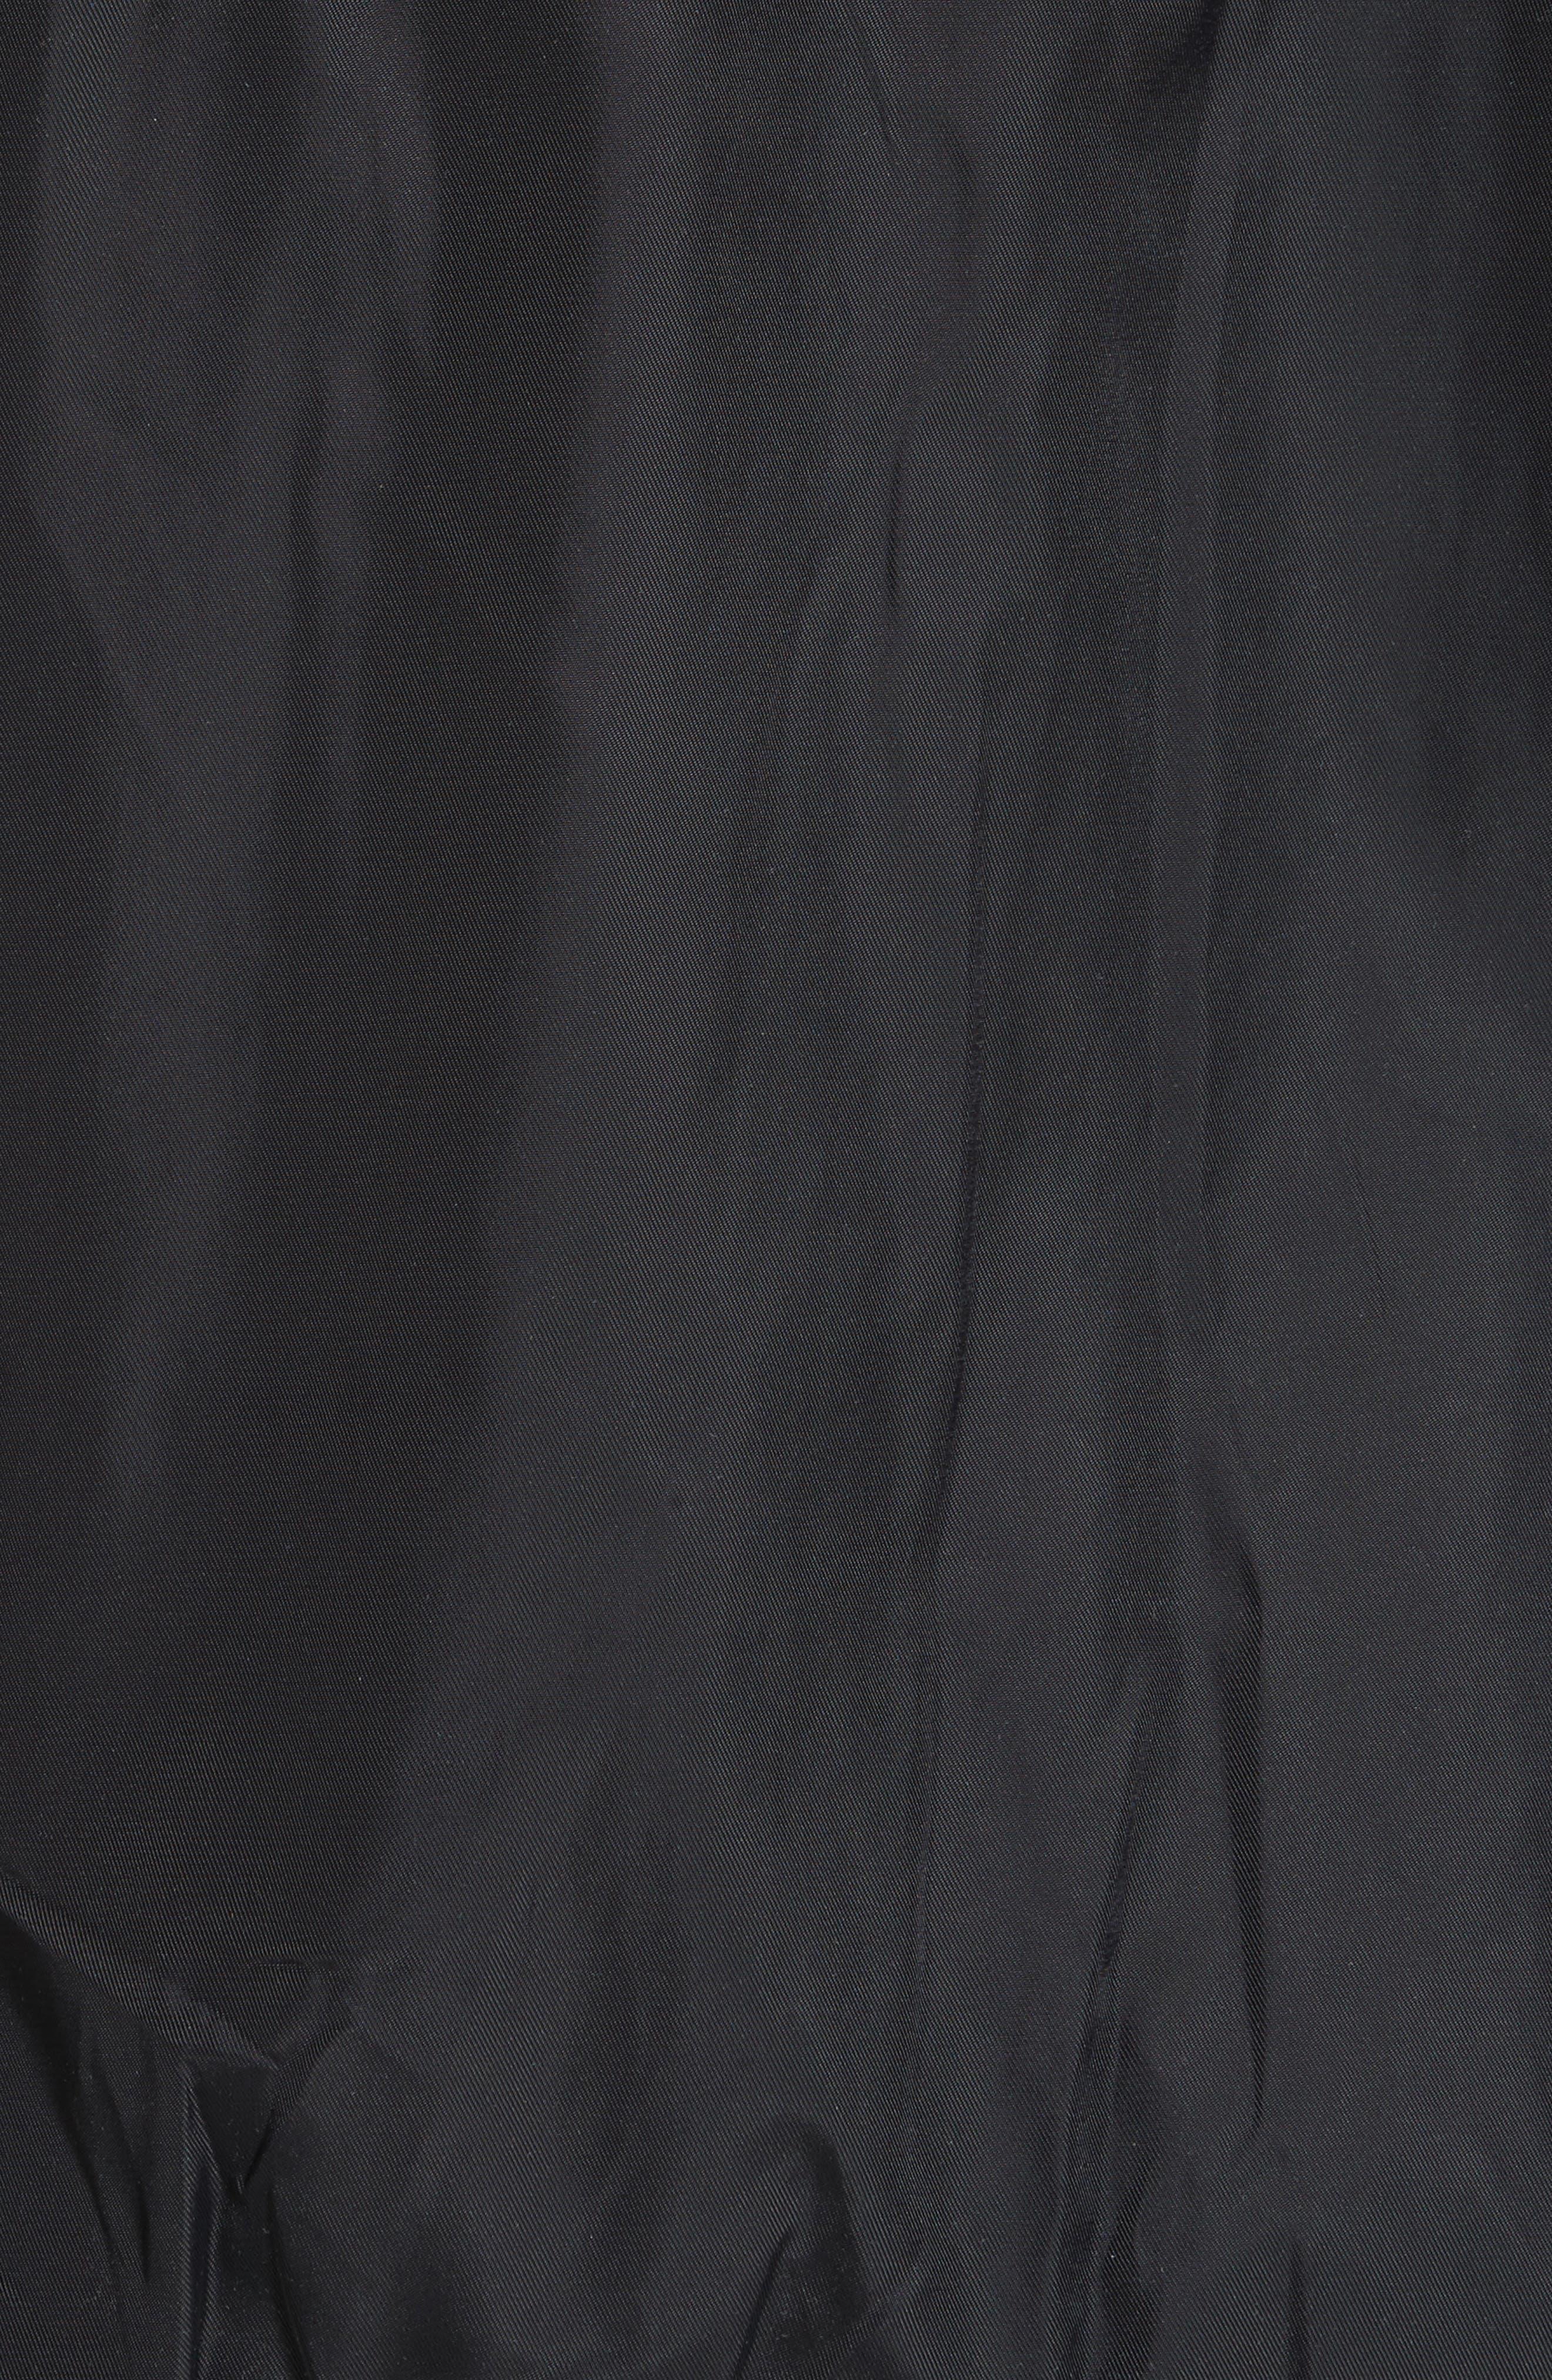 Studded Western Varsity Jacket,                             Alternate thumbnail 5, color,                             Black Multi